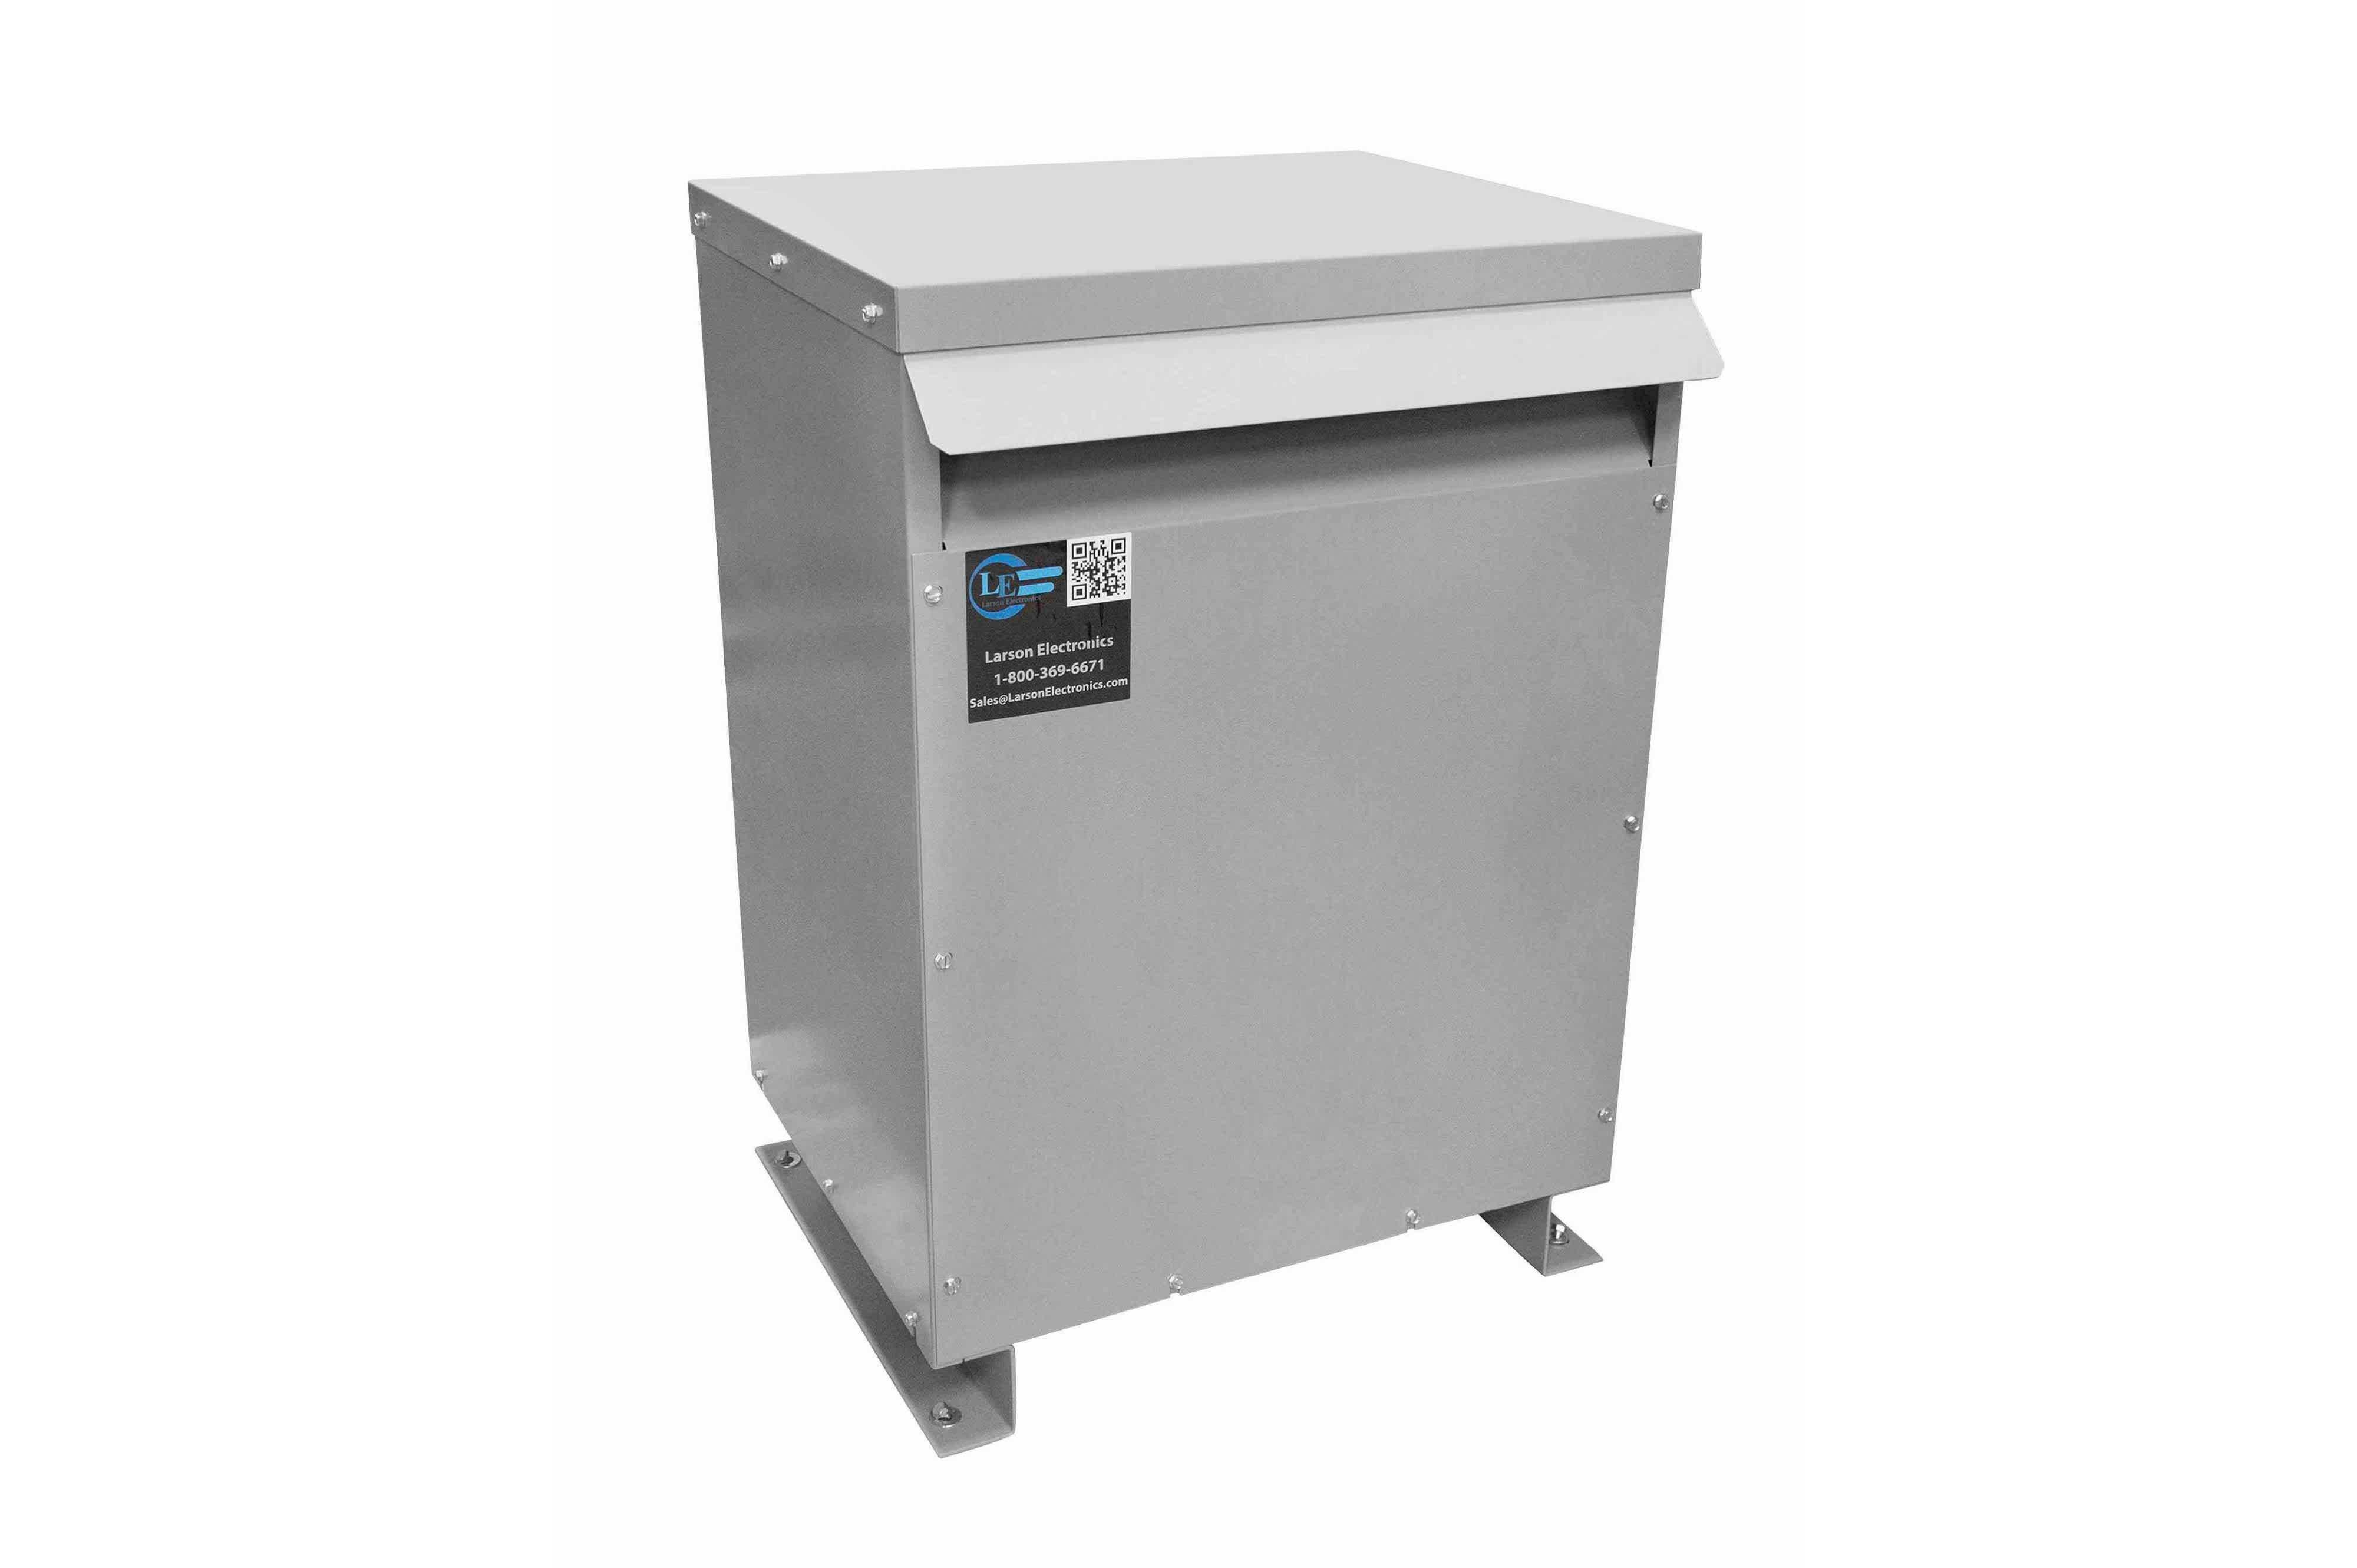 90 kVA 3PH Isolation Transformer, 575V Wye Primary, 415V Delta Secondary, N3R, Ventilated, 60 Hz